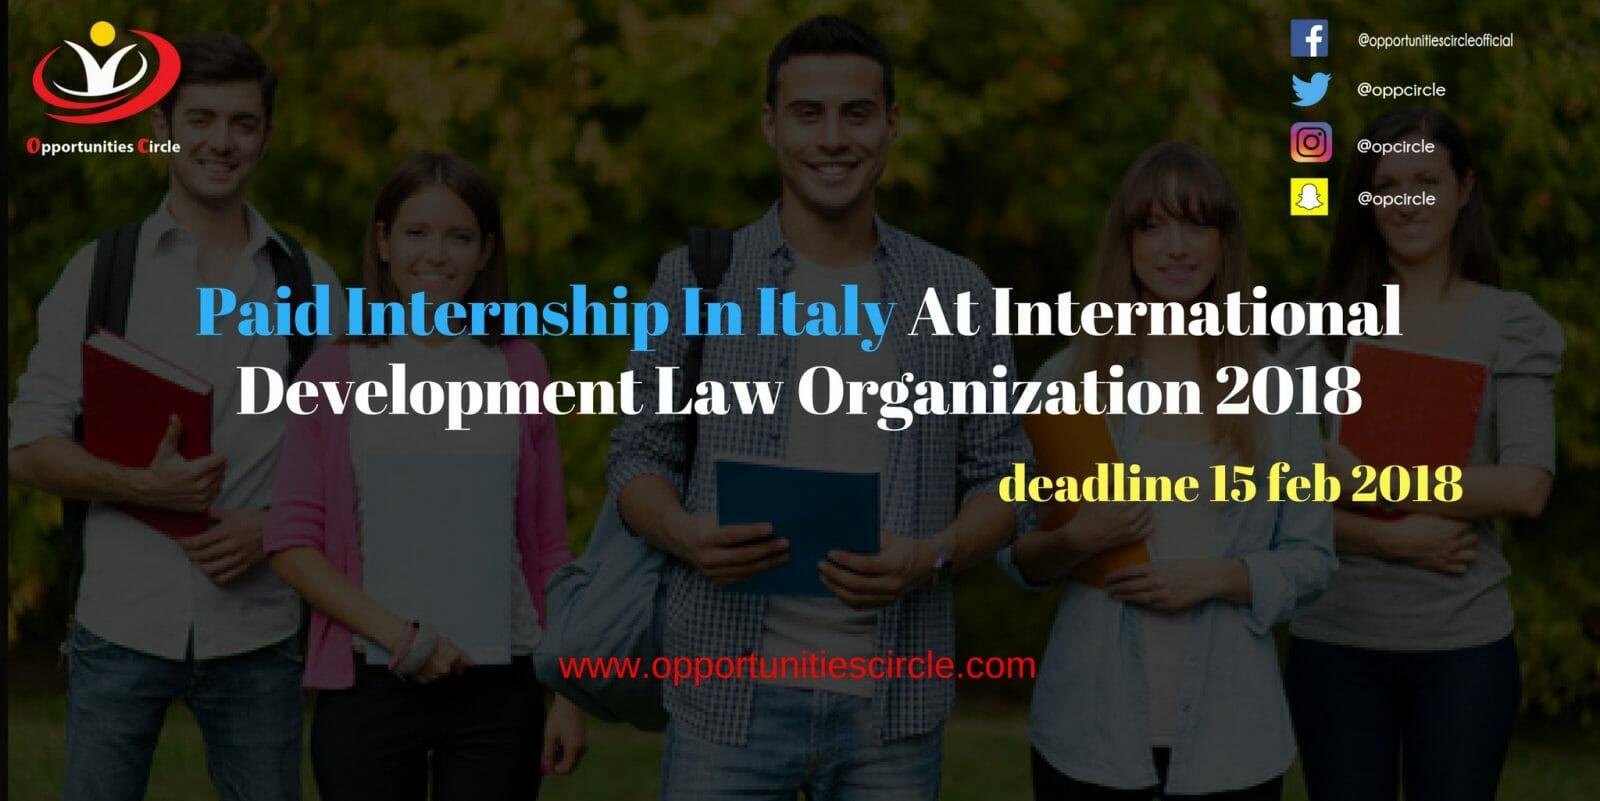 Paid Internship In Italy At International Development Law Organization 2018 - Paid Internship In Italy At International Development Law Organization 2018